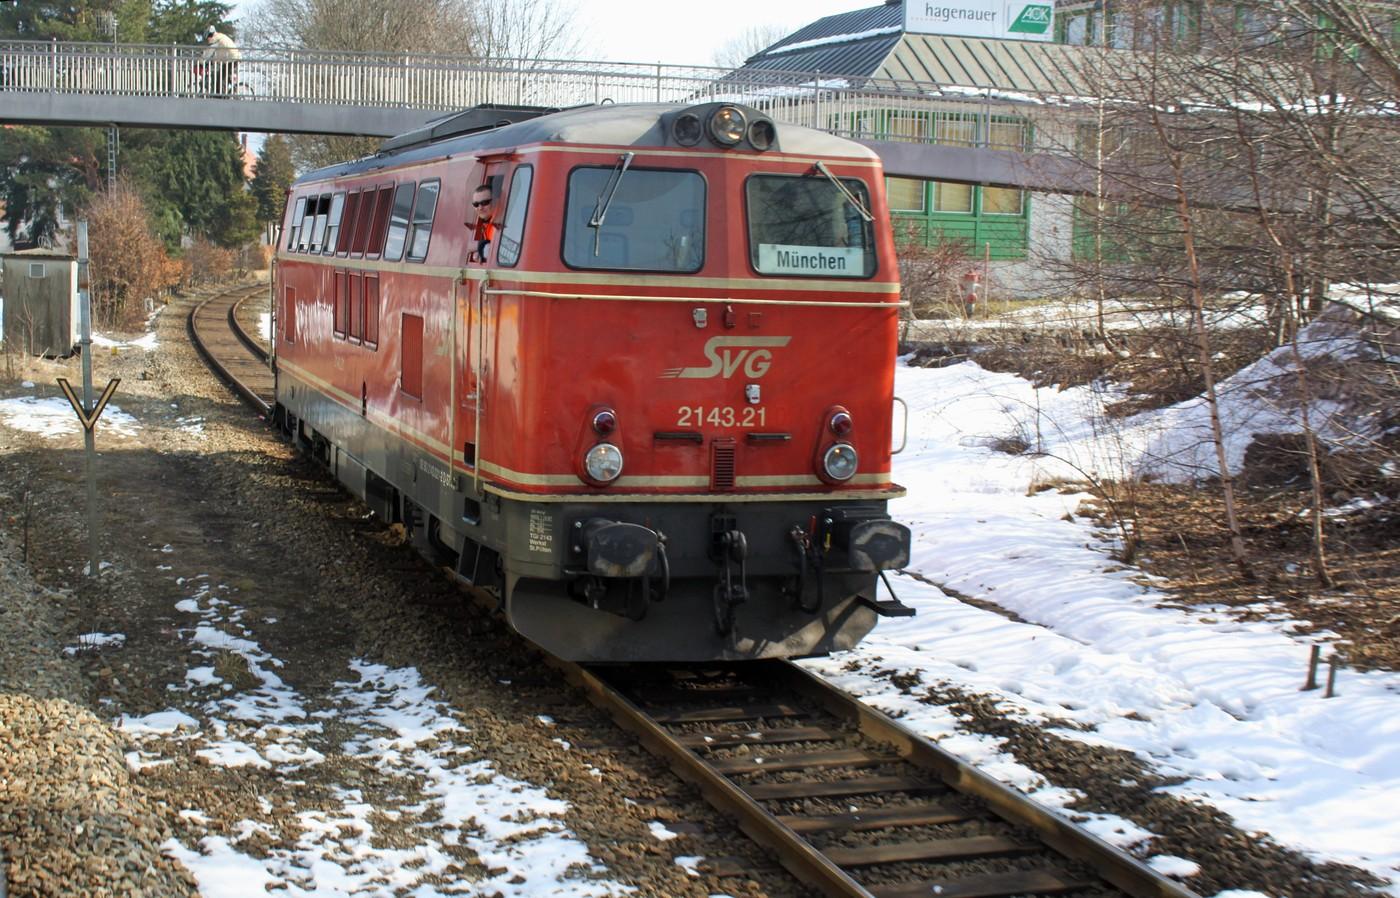 http://www.eisenbahn-im-bild.de/Temp/D_11_Immen_IMG_8449.jpg